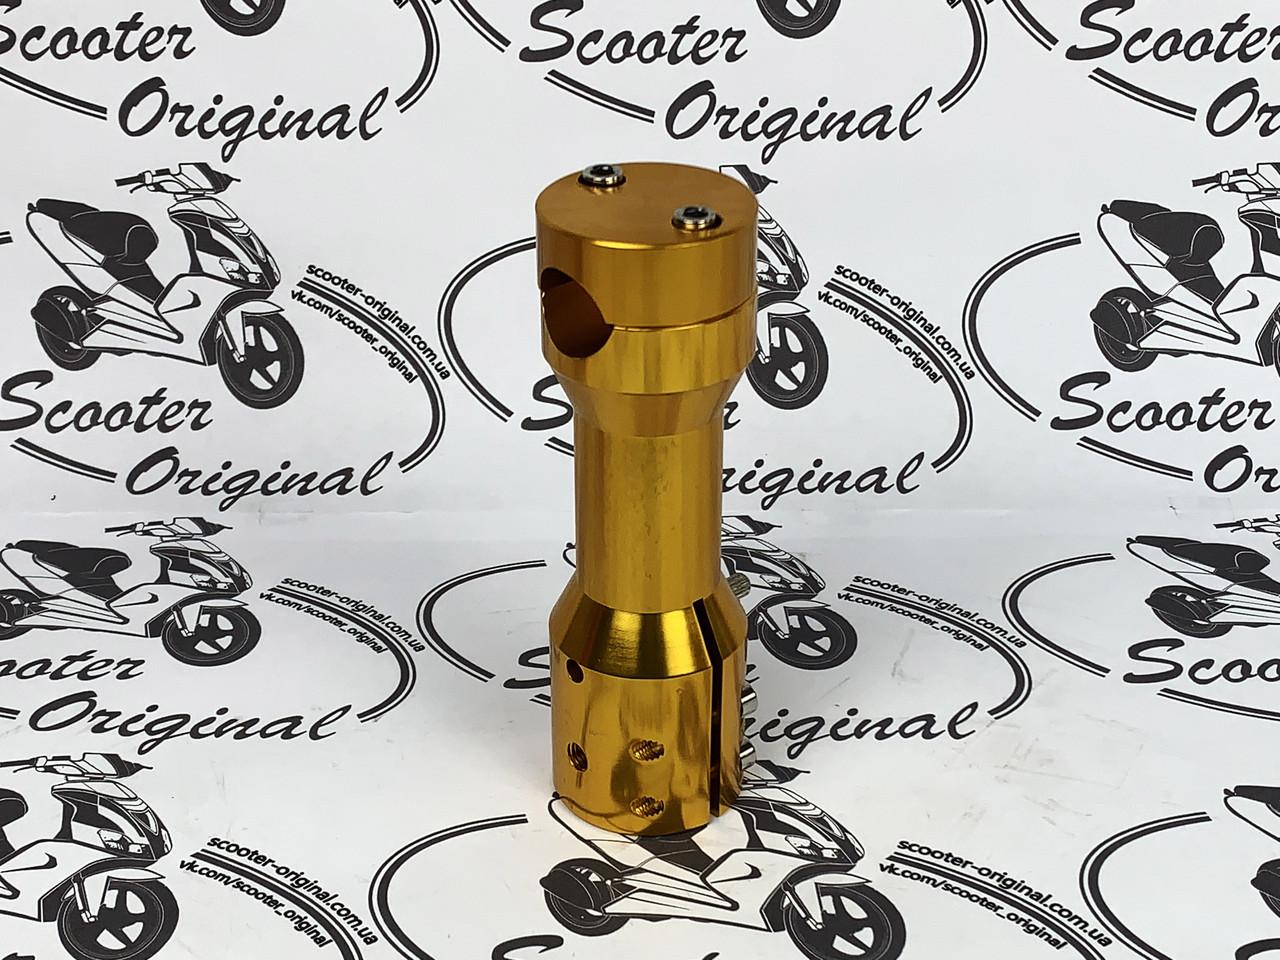 Вынос руля на скутер желтый (для рулей Ø22 мм) Yamaha JOG RR SA12J BWS Slider Neos Aprilia SR MBK Rocket Stunt